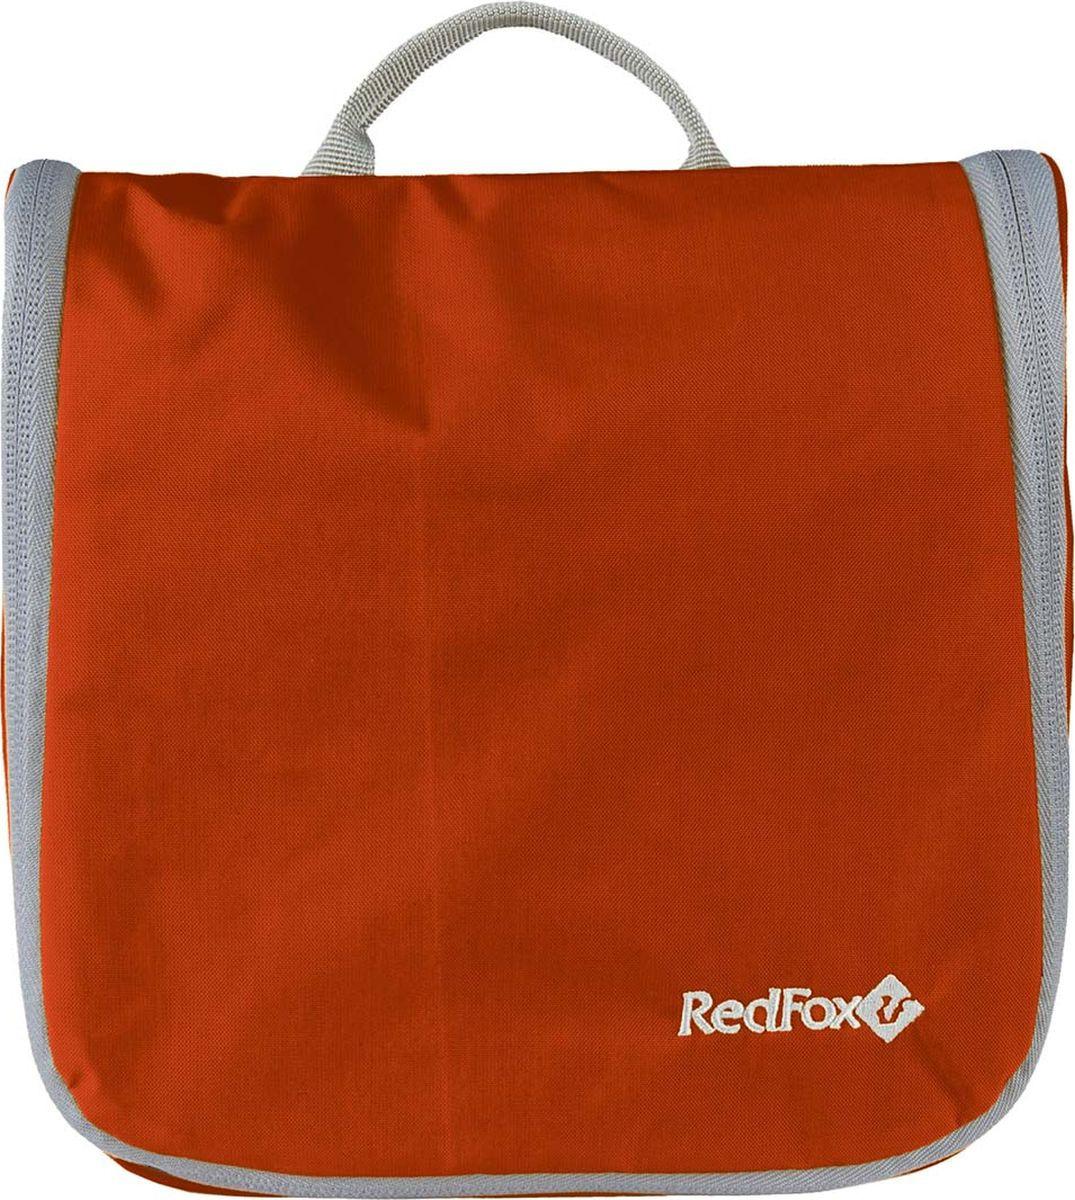 Сумка дорожная Red Fox Voyager M, 1046753, оранжевый, 40 х 24 х 8 см сарафан fox hd